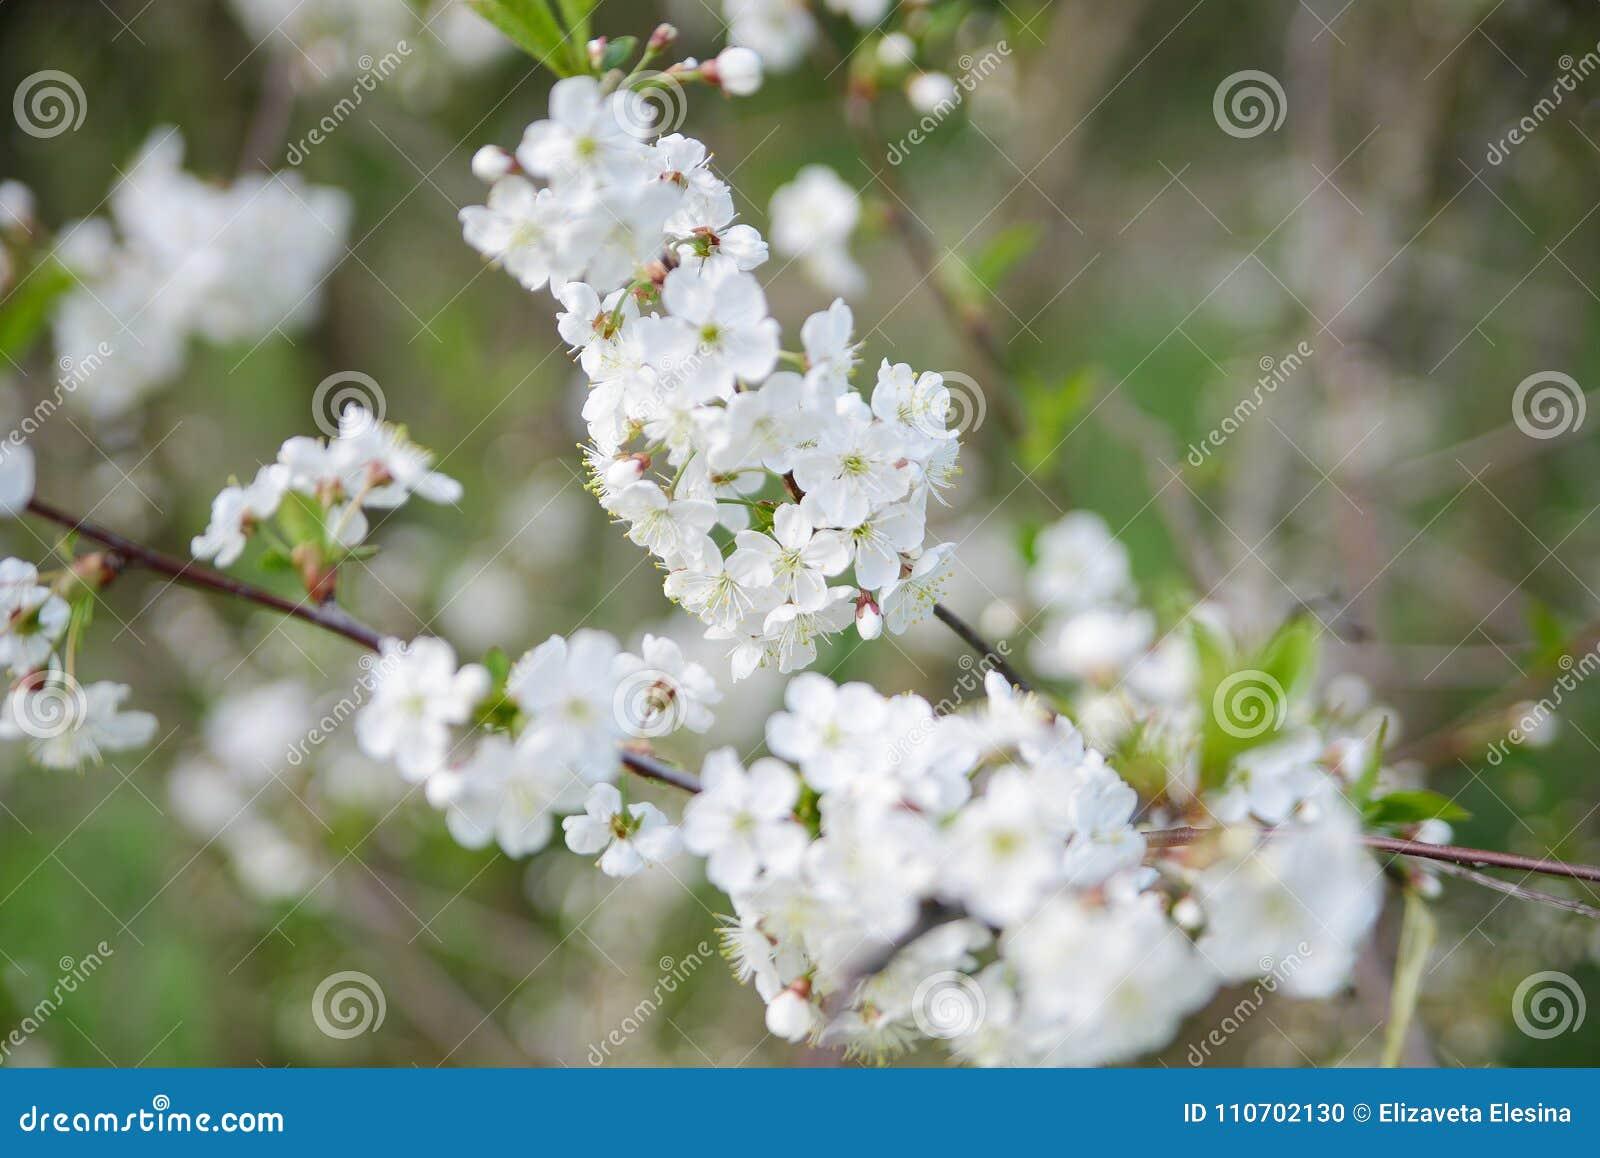 White Apple Flowers Beautiful Flowering Apple Trees Background